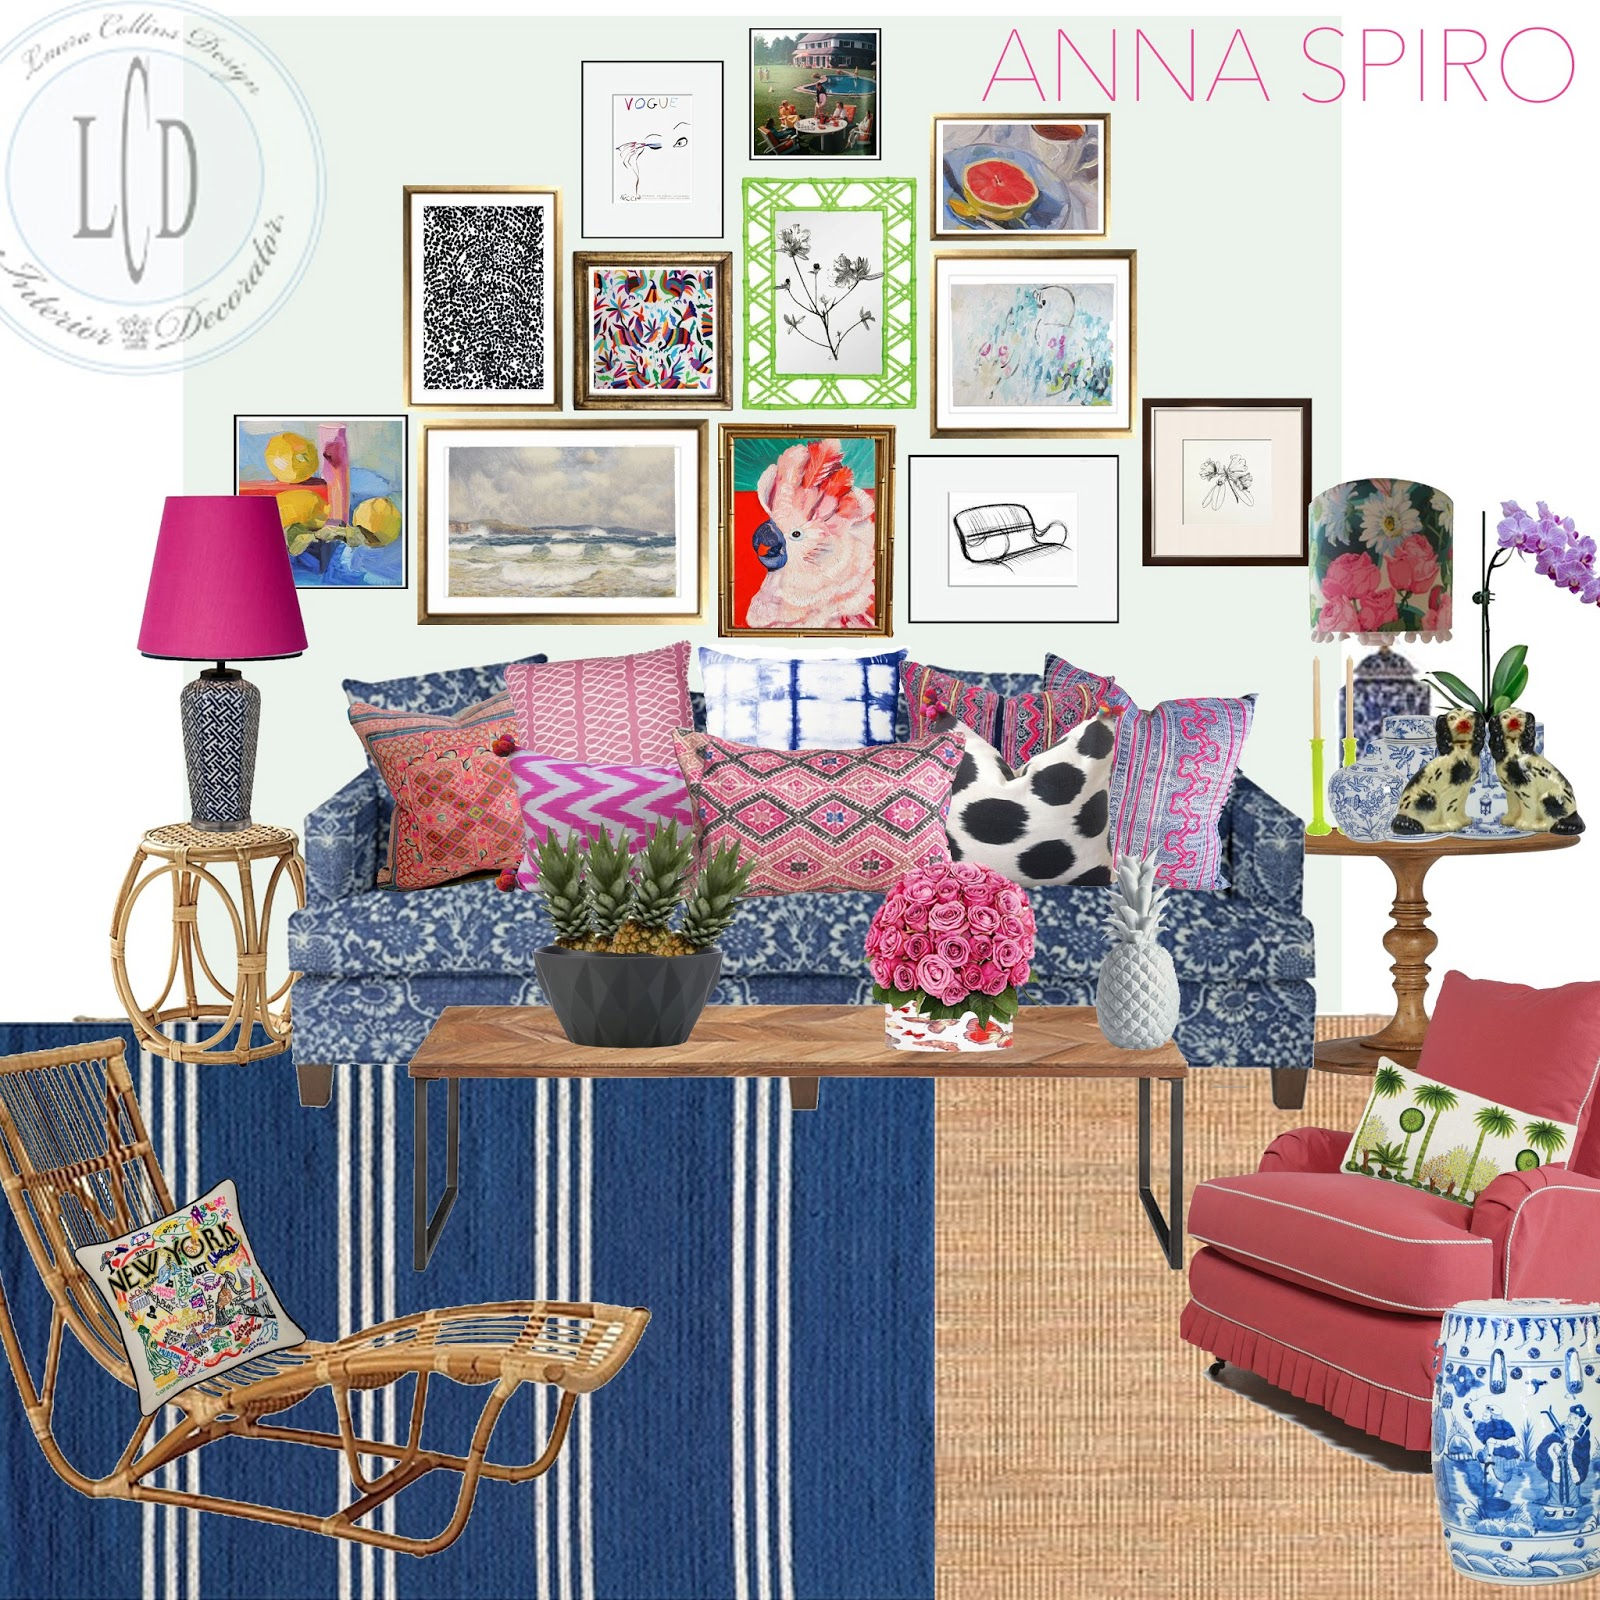 49] Anna Spiro Wallpaper in USA on WallpaperSafari 1600x1600